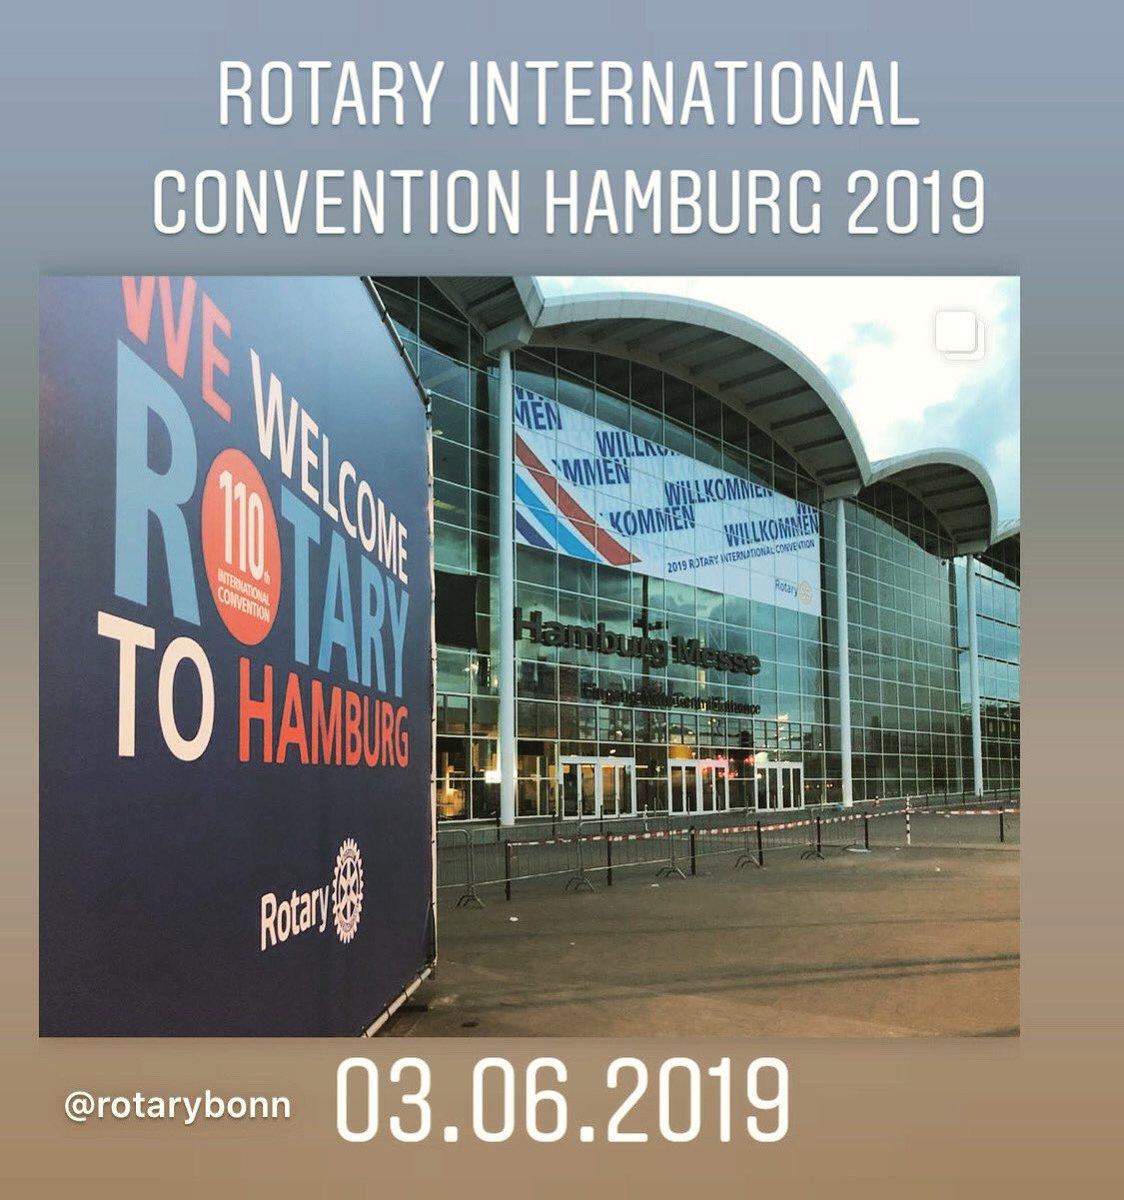 #Rotary international convention #Hamburg 2019 #tbt #throwbackthursday #rotarians #worldwide #united in @hamburg_de  #HH #rotarian #friendship #Rotaract #inAction #bethechange #betheinspiration #RotaryBonn https://t.co/xTsmwtTHFr